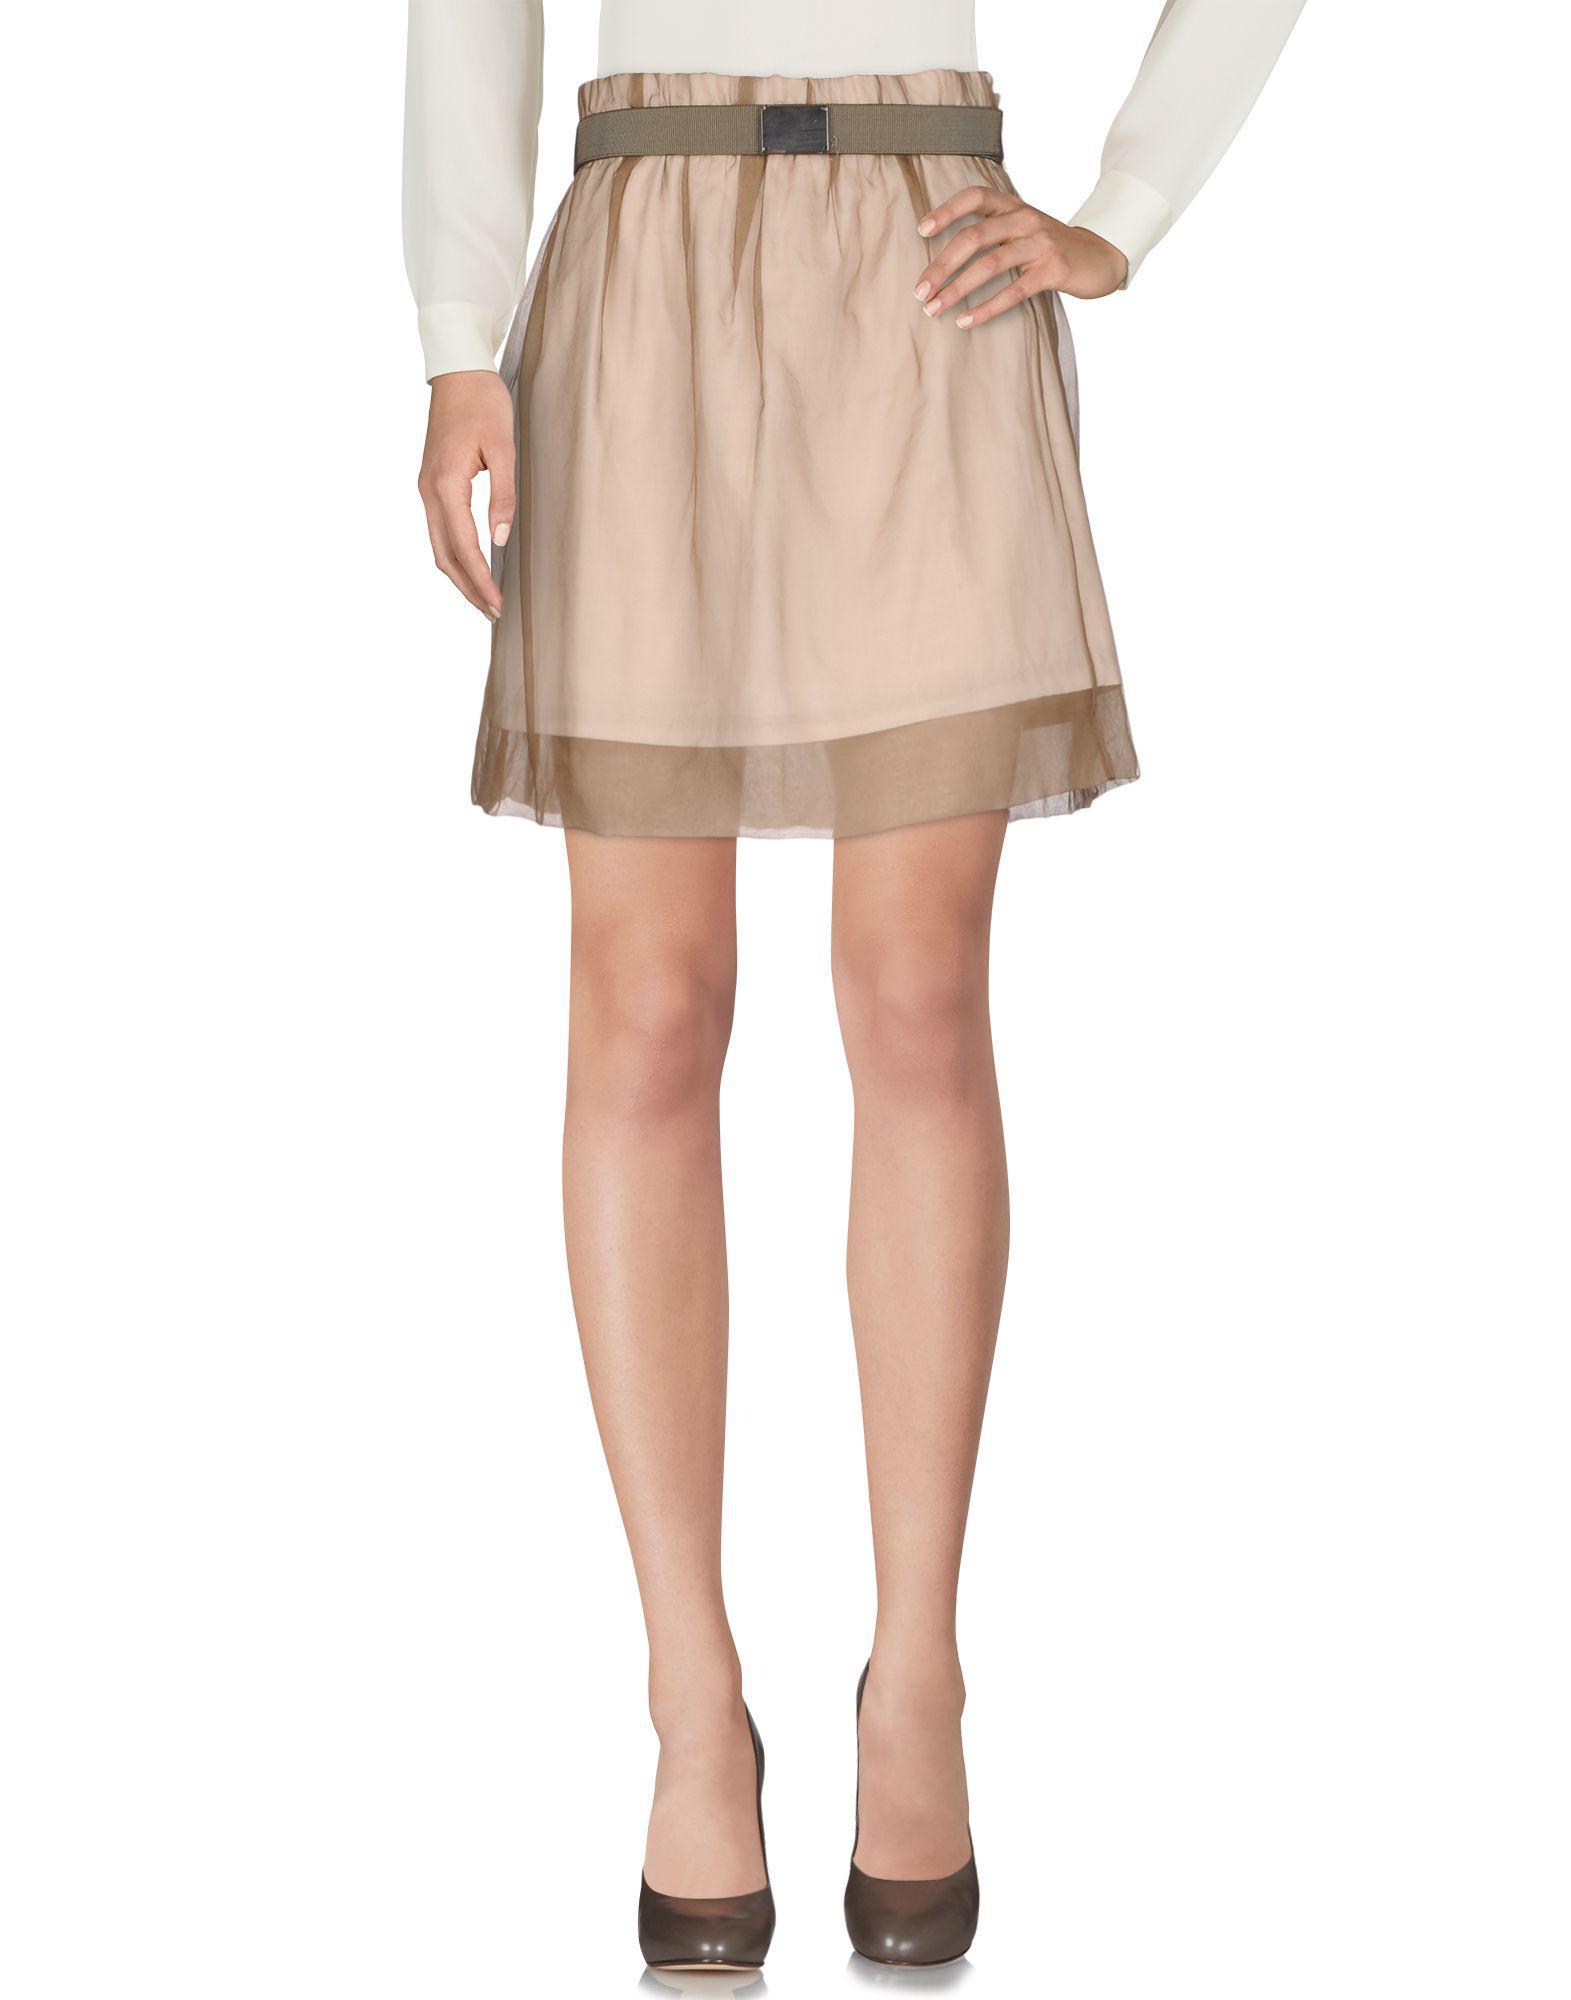 807c757b5 Brunello Cucinelli Knee Length Skirt in Natural - Lyst